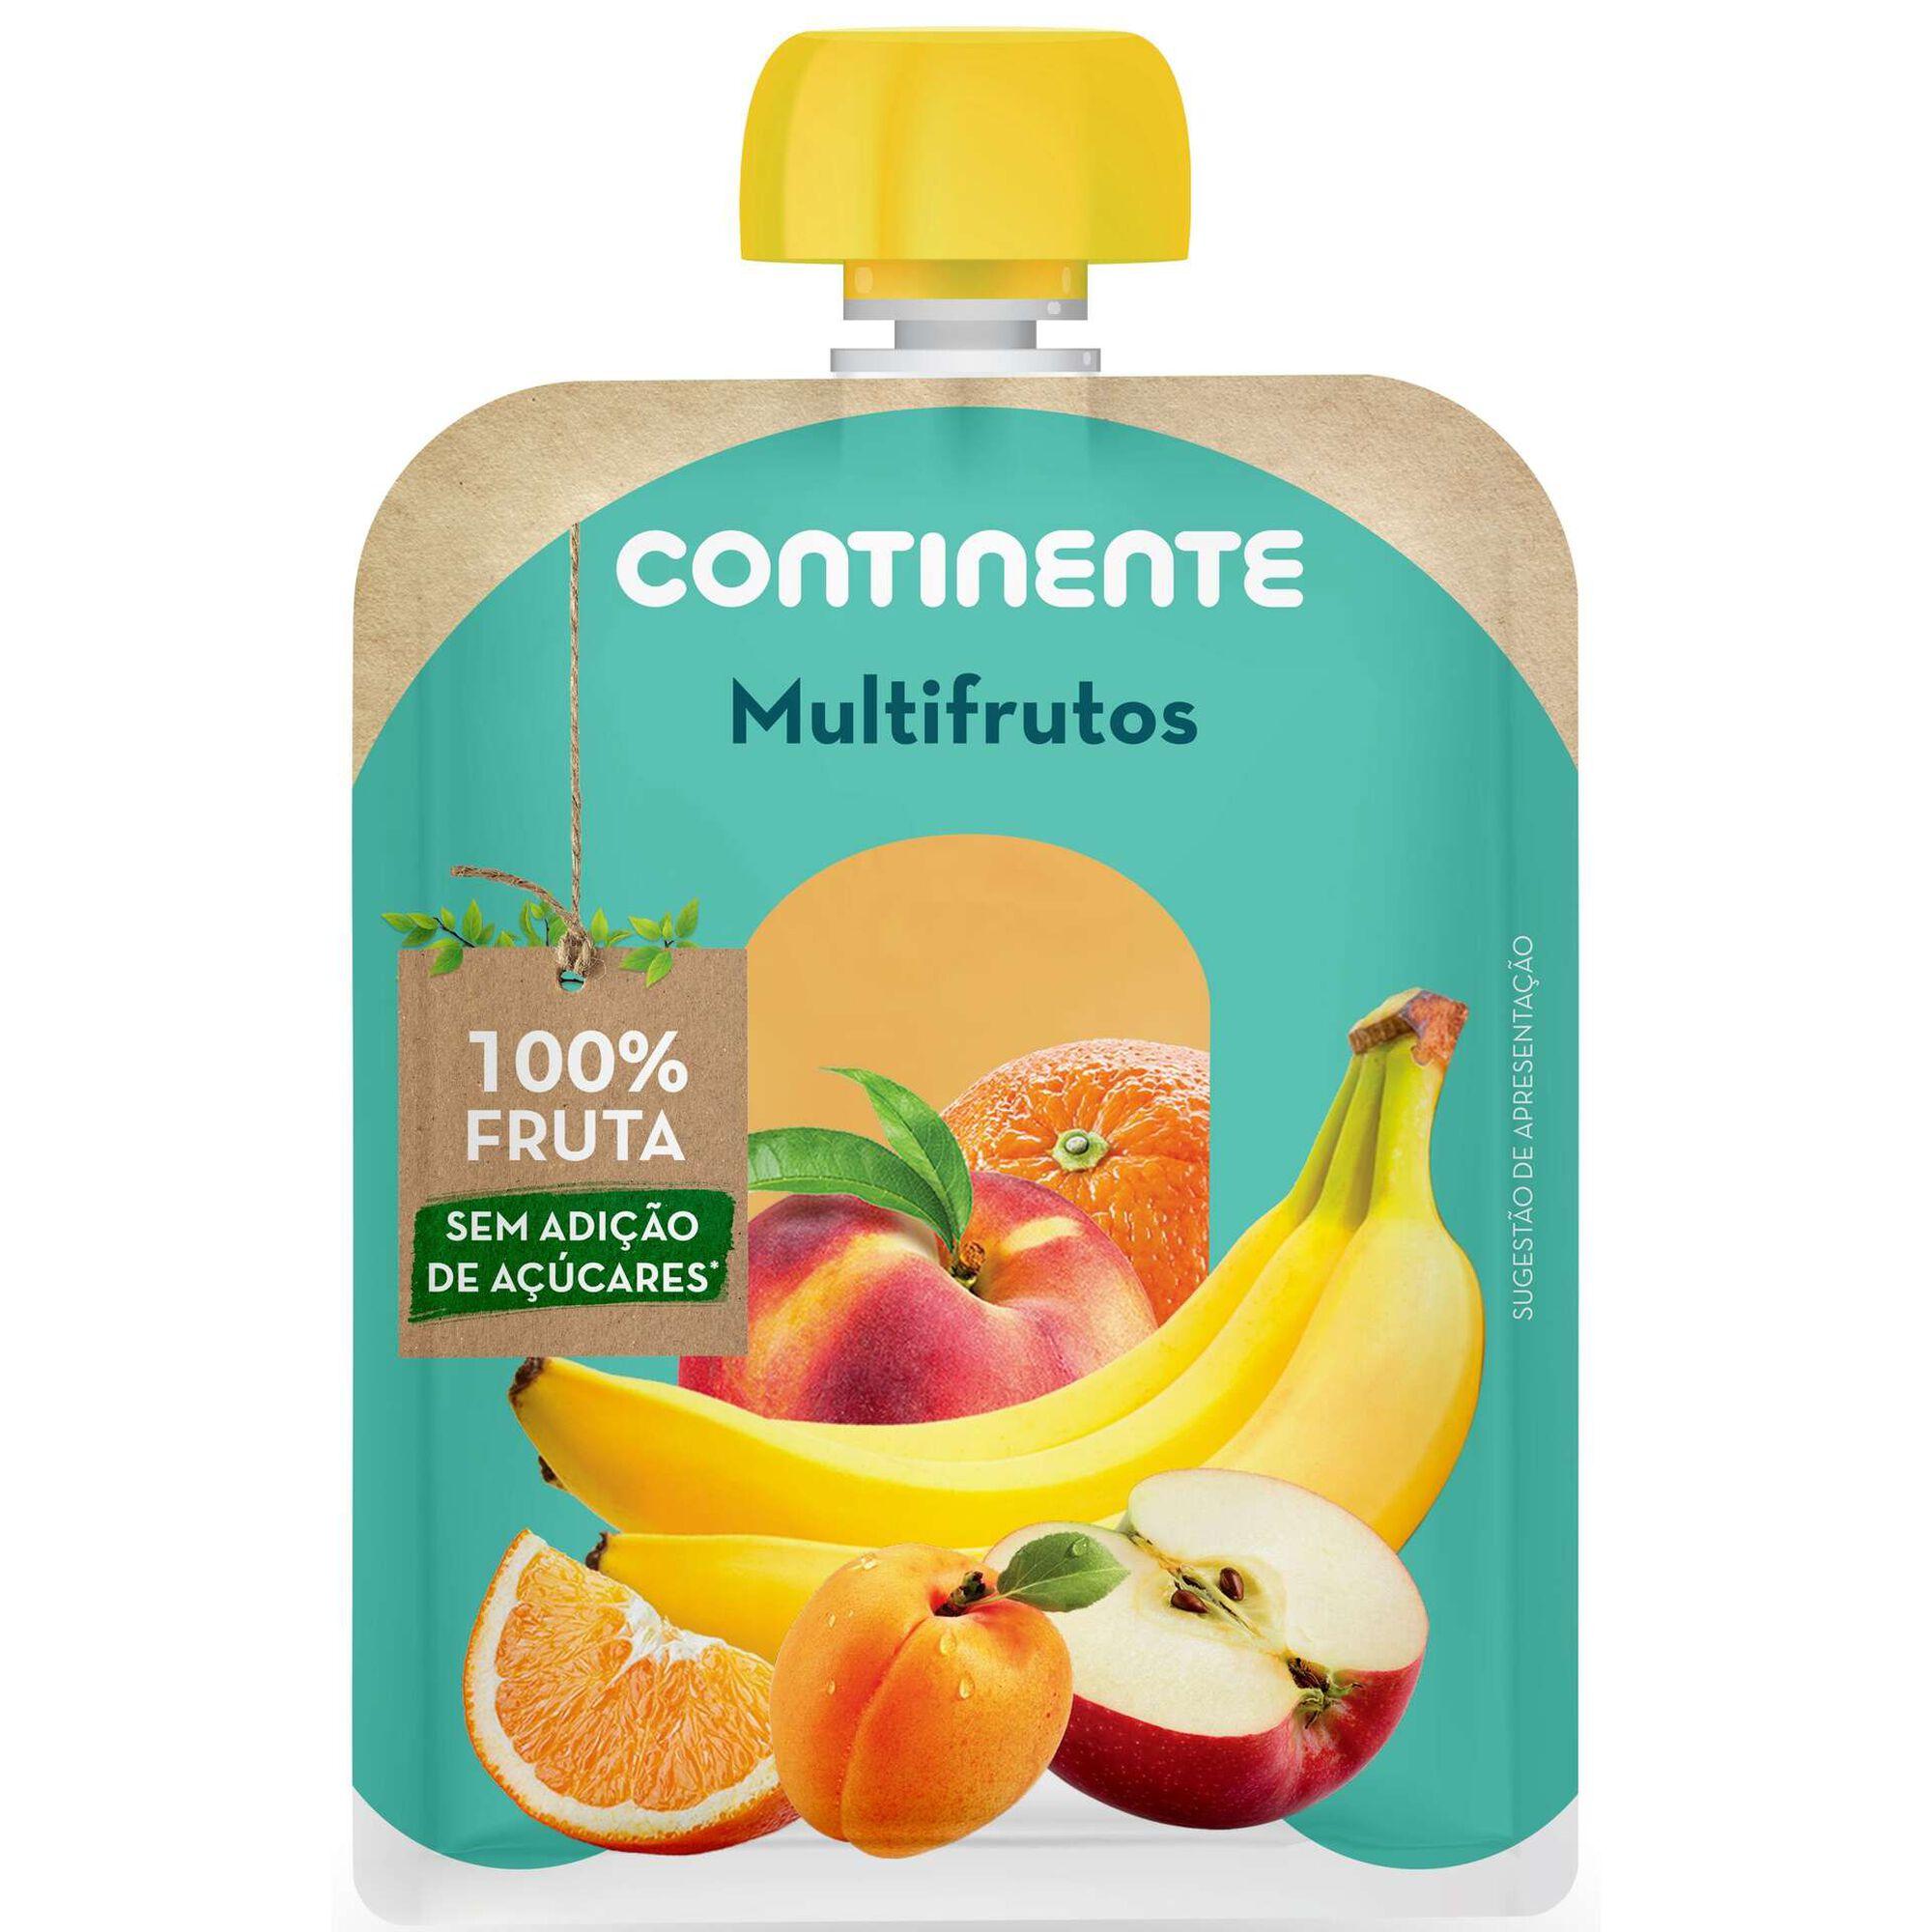 Saqueta de Fruta Multifrutos